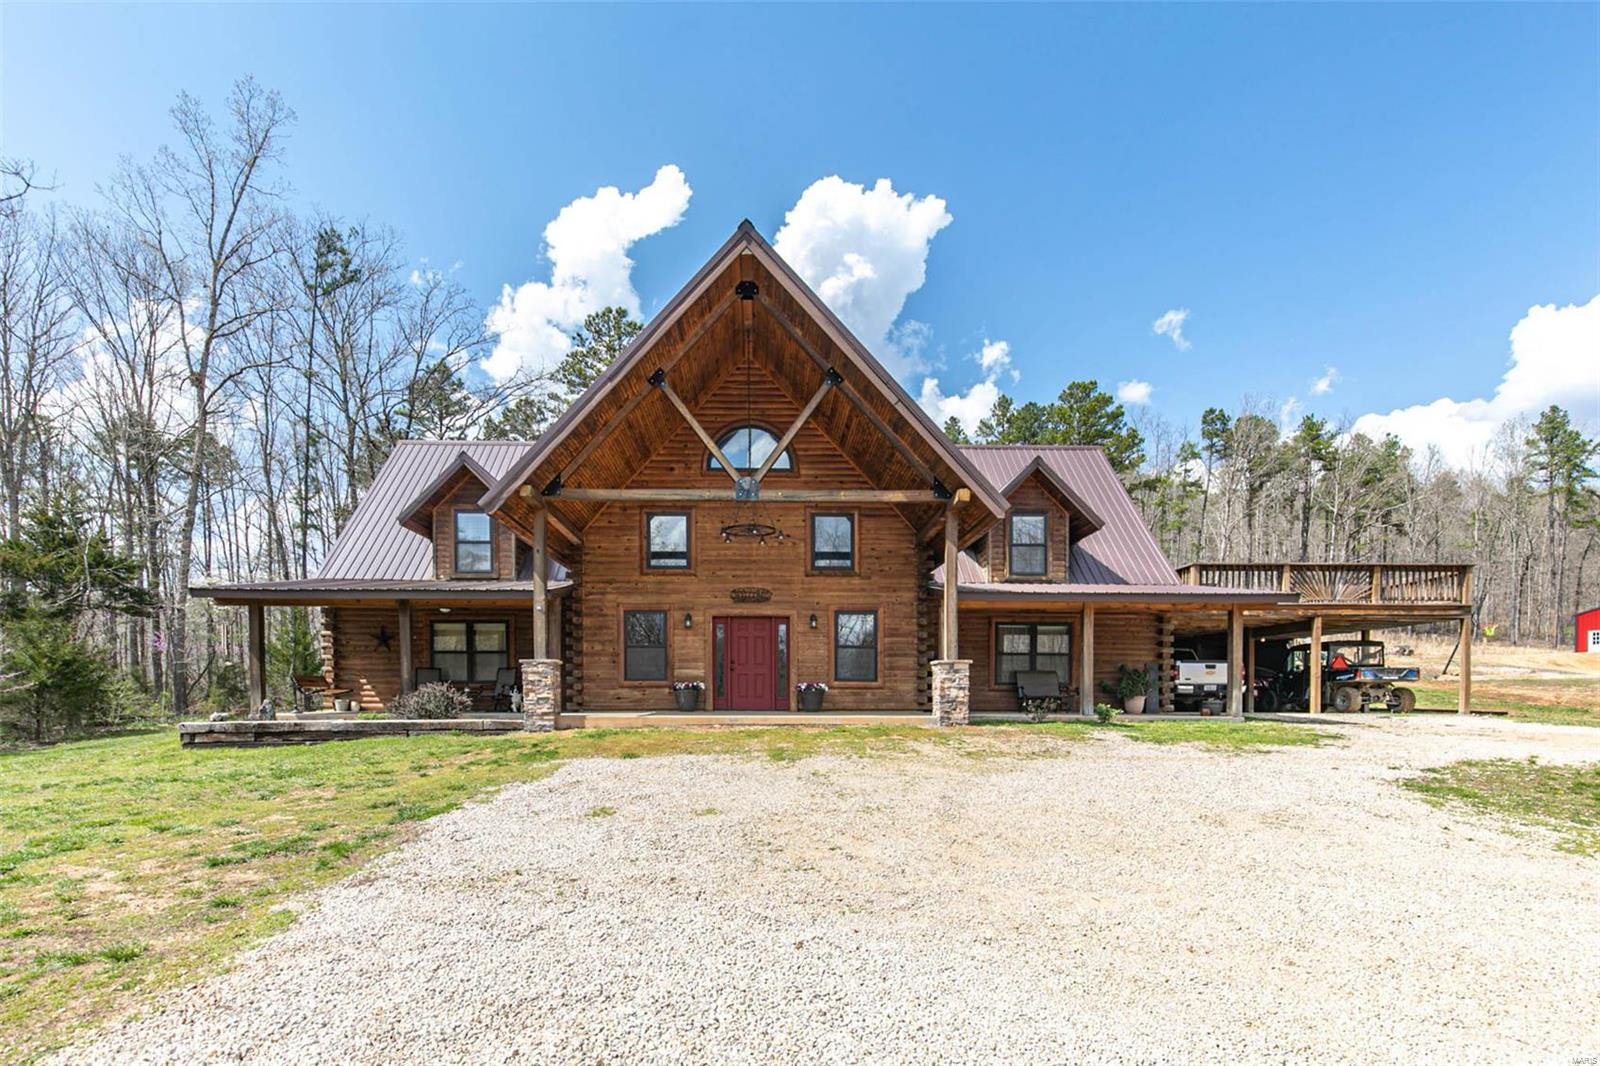 77 Carter 115 Property Photo - Van Buren, MO real estate listing